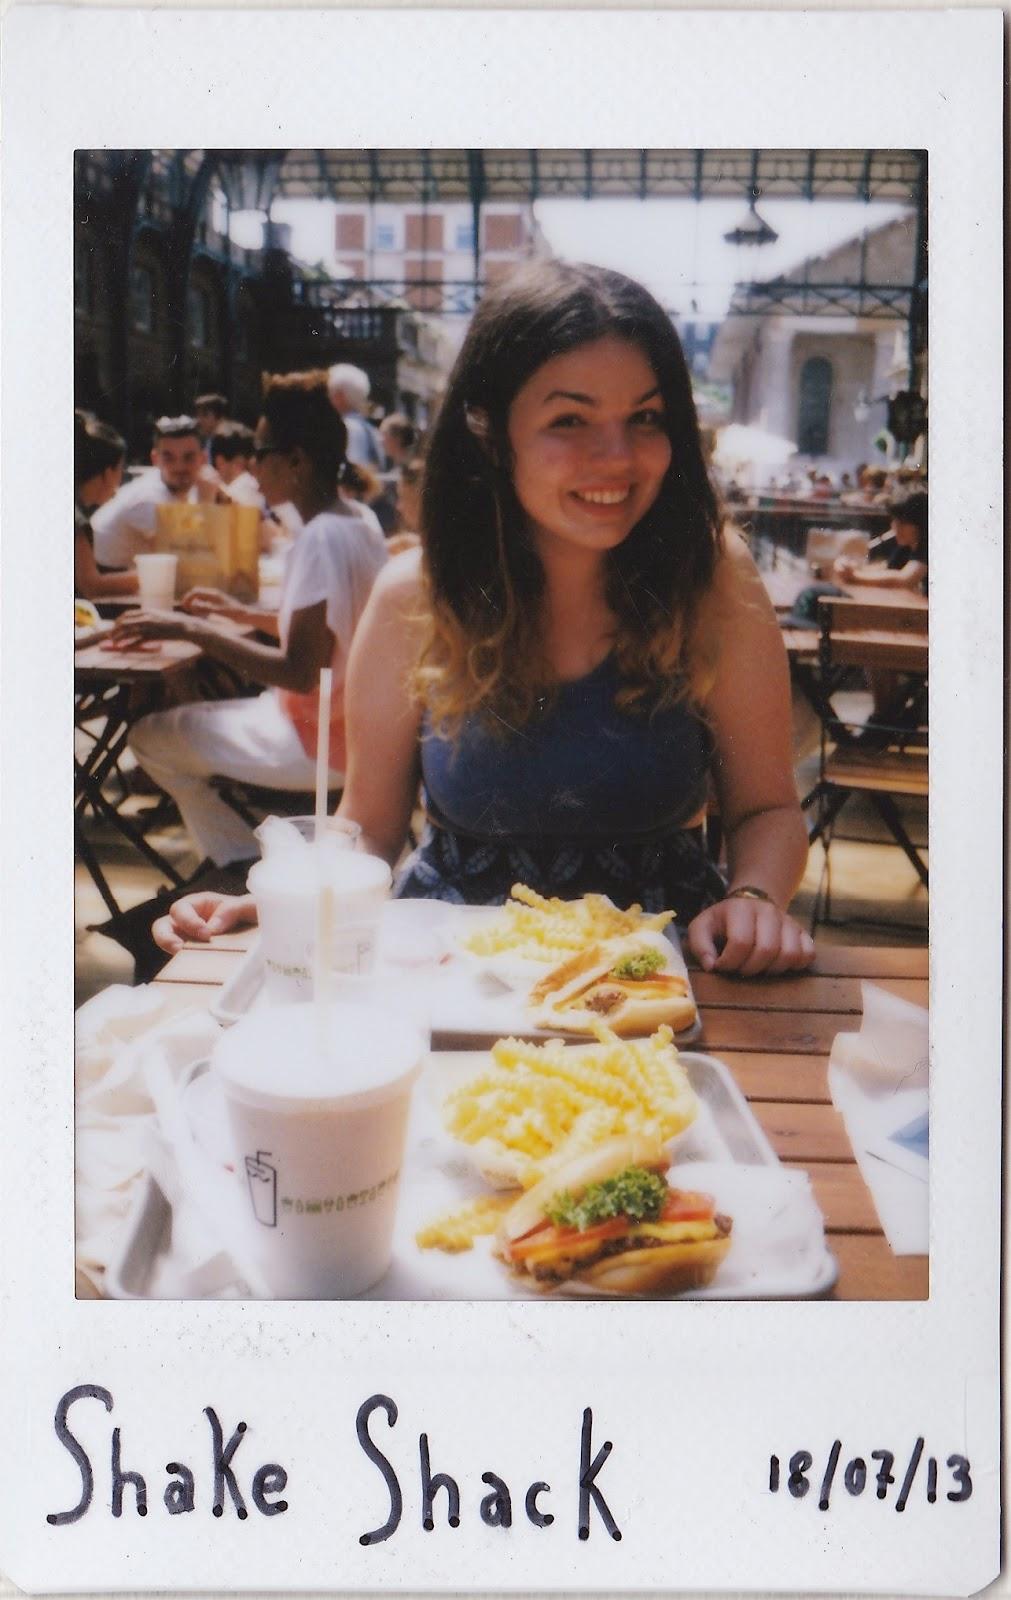 Polaroid of burgers